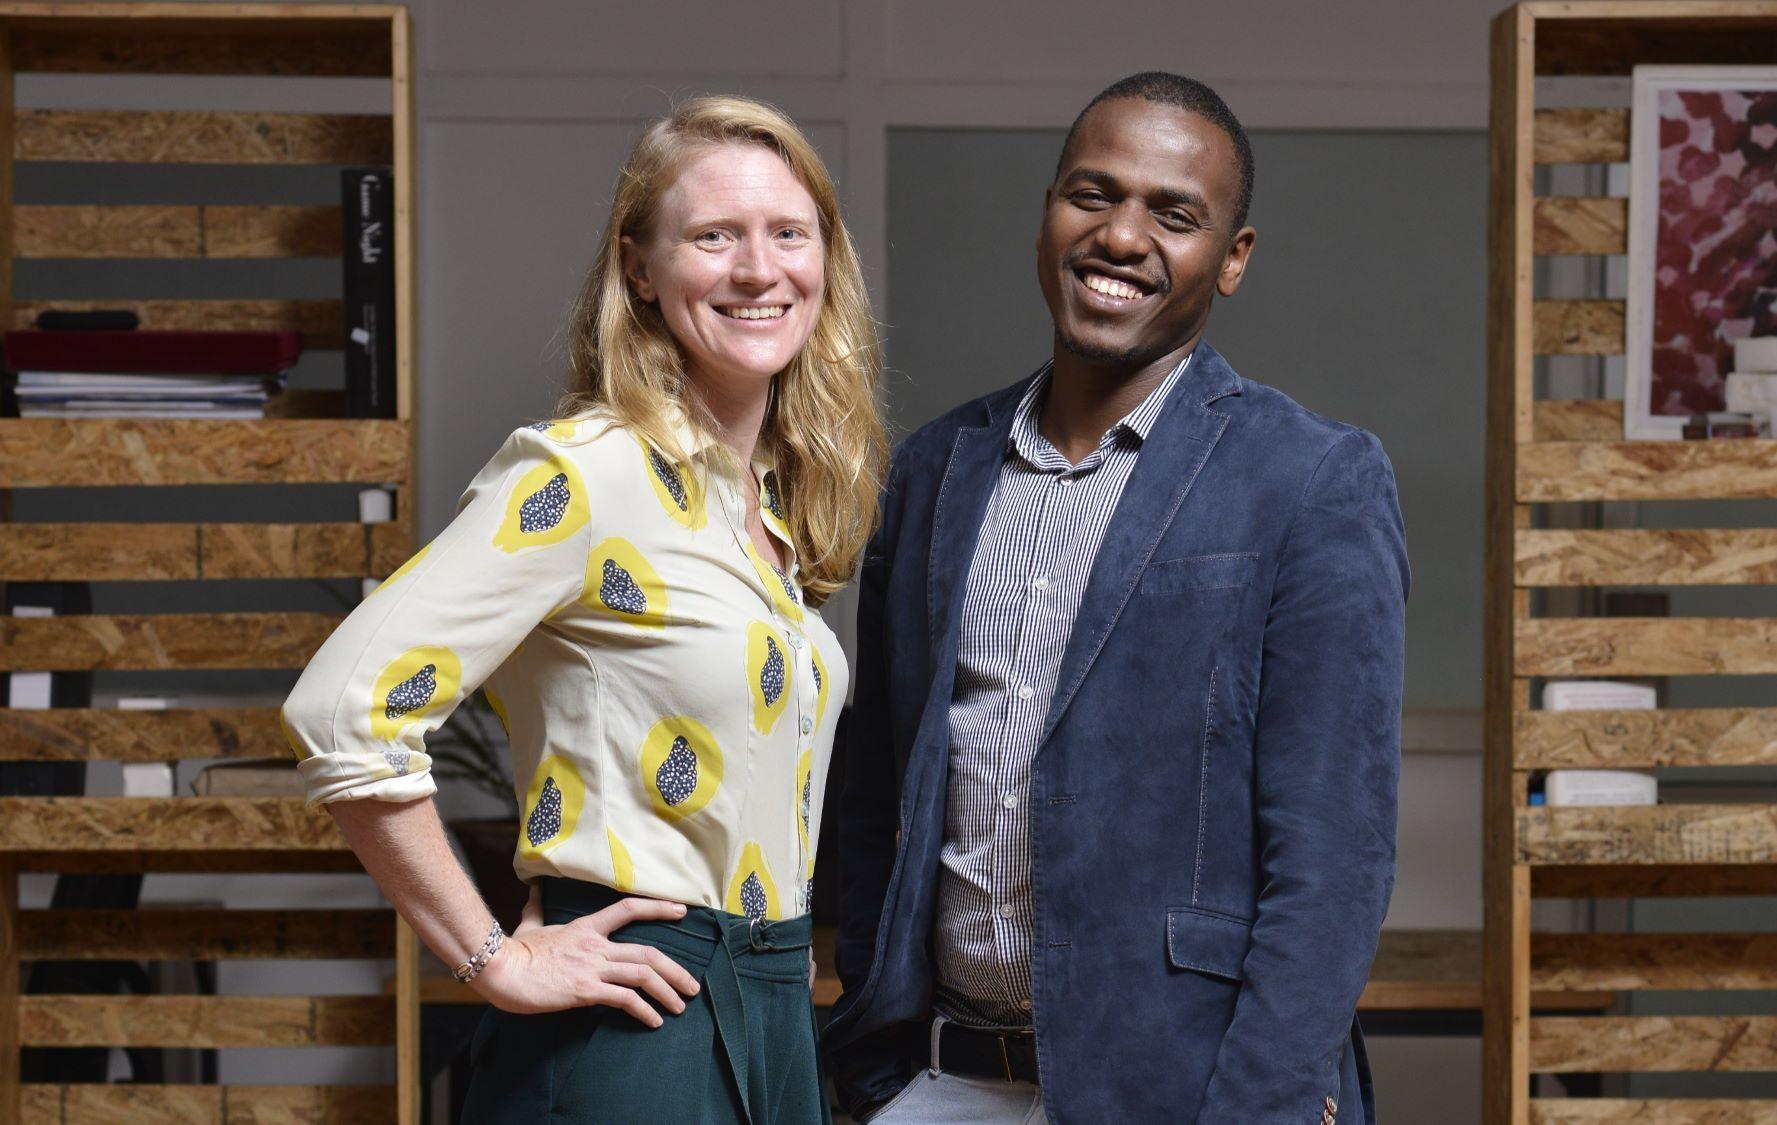 Pula Co-Founders and Co-CEOs - Thomas Njeru & Rose Goslinga Brandspurng Pan-African Insurtech Startup Pula raises $6mn Series A